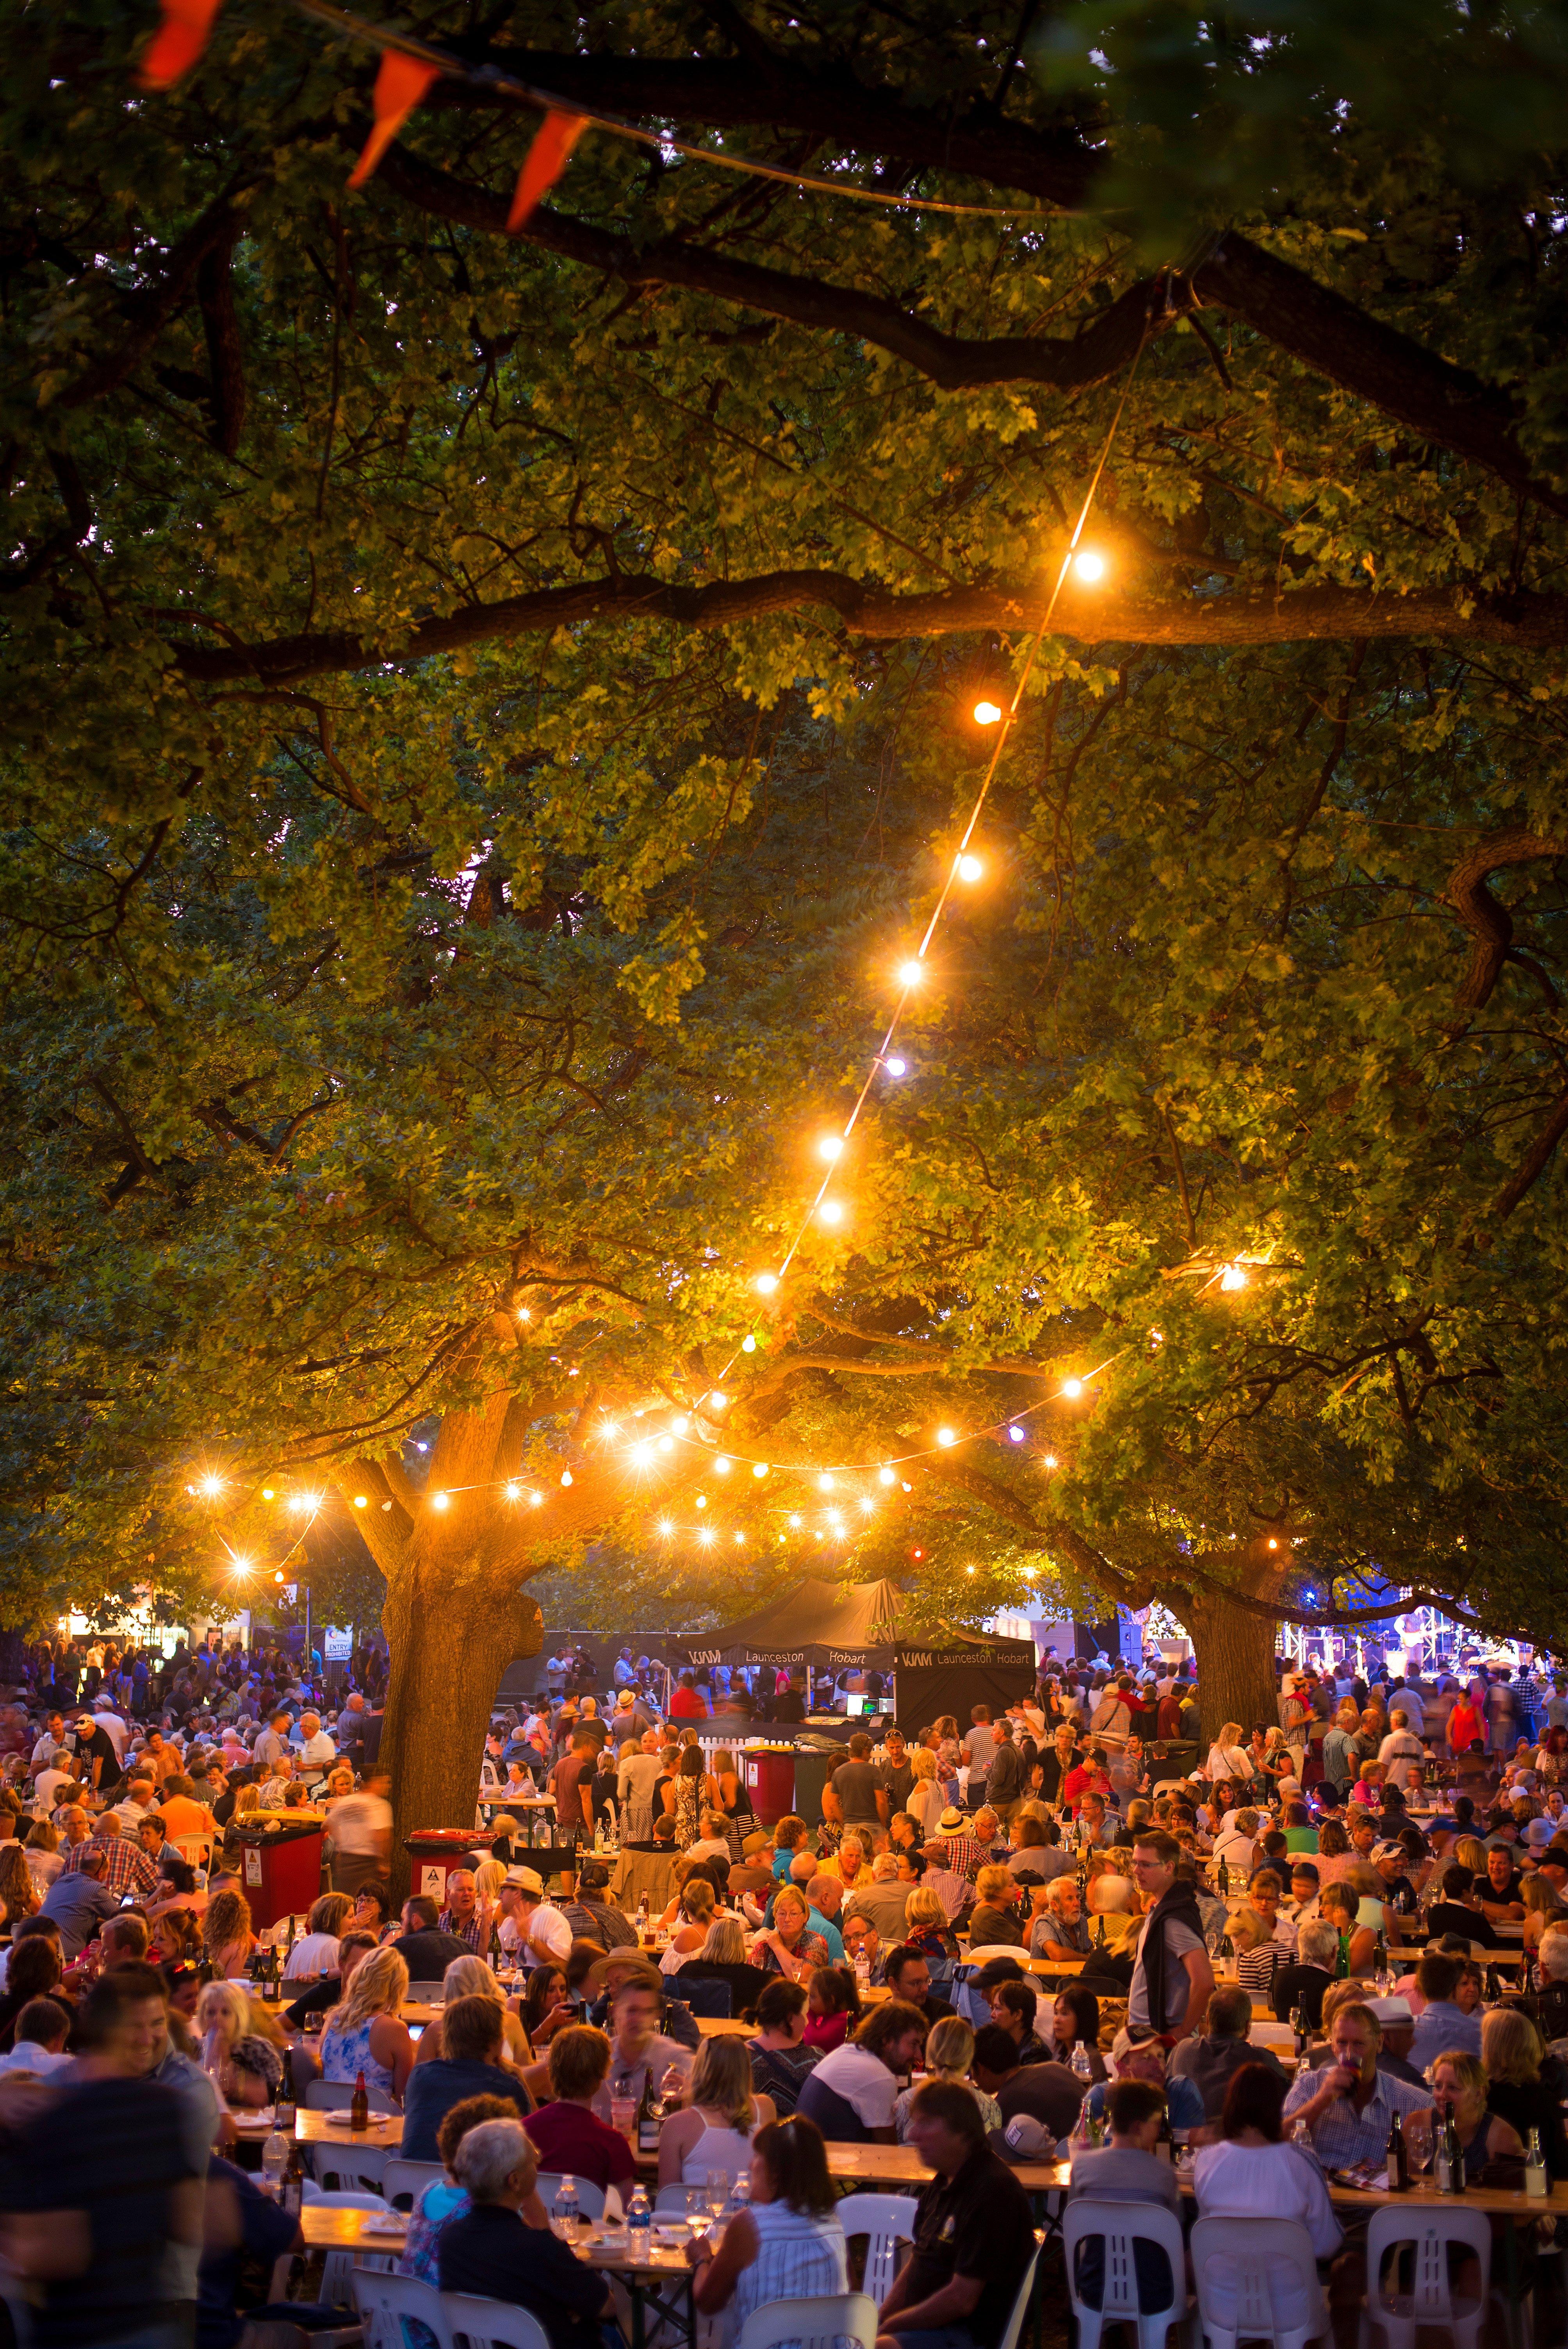 Evening crowd and garland tree lighting